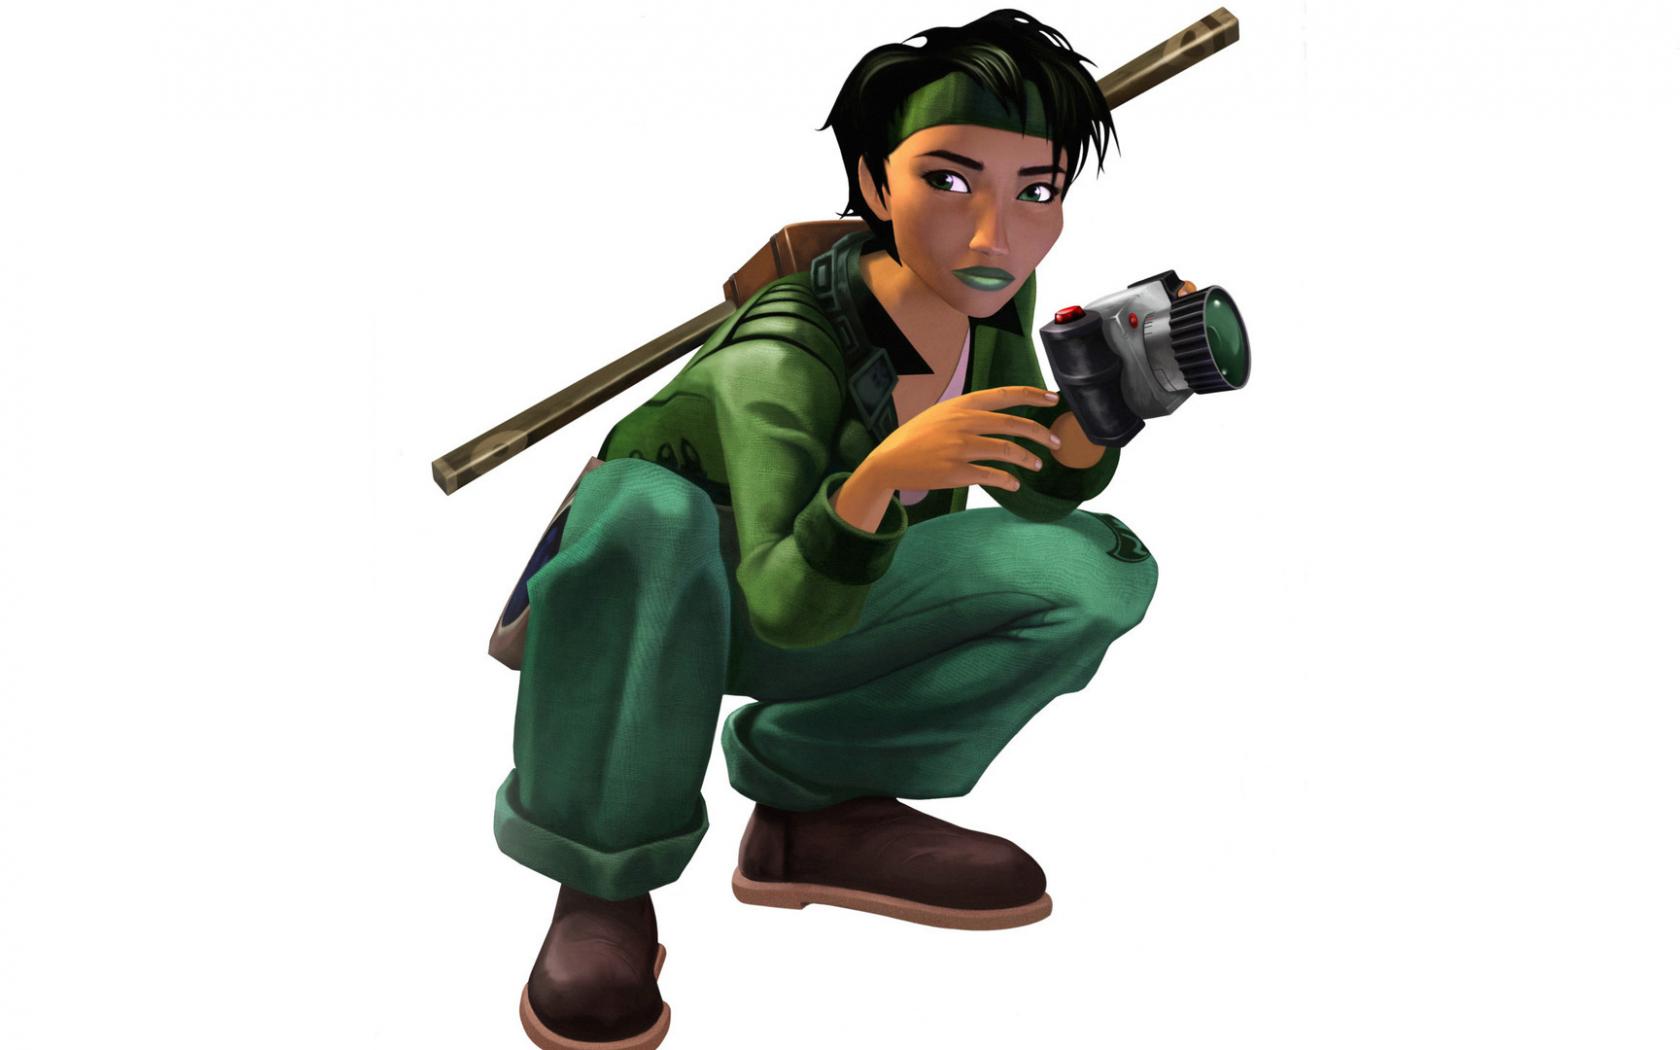 Free Download Jade Beyond Good And Evil 2 Wallpaper Game